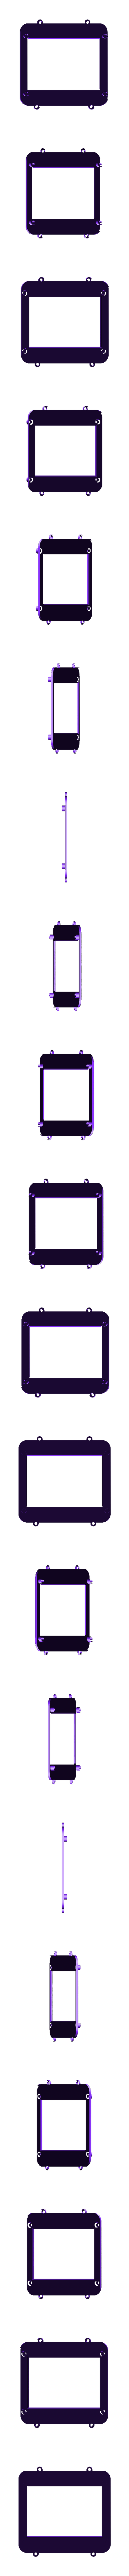 pyplant-screen.stl Download free STL file IOT Smart Pet Planter • Template to 3D print, Adafruit